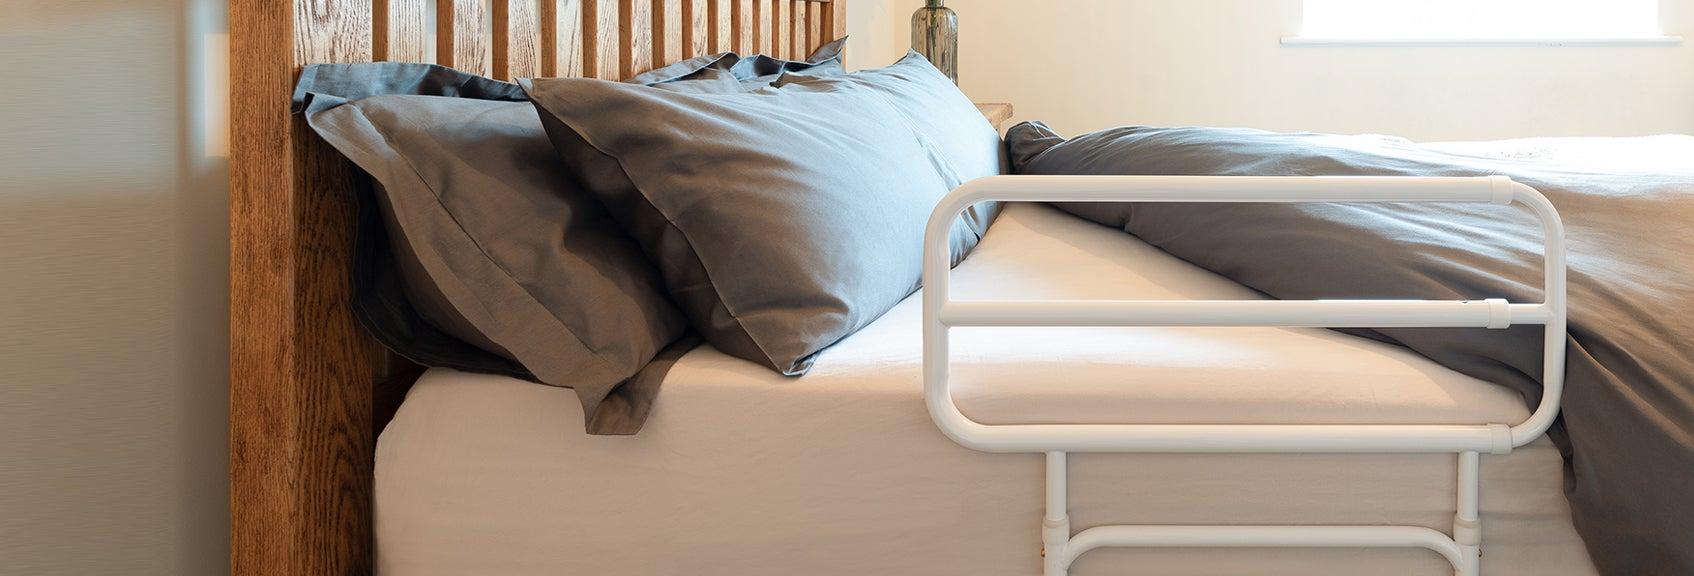 Bedroom grab rails